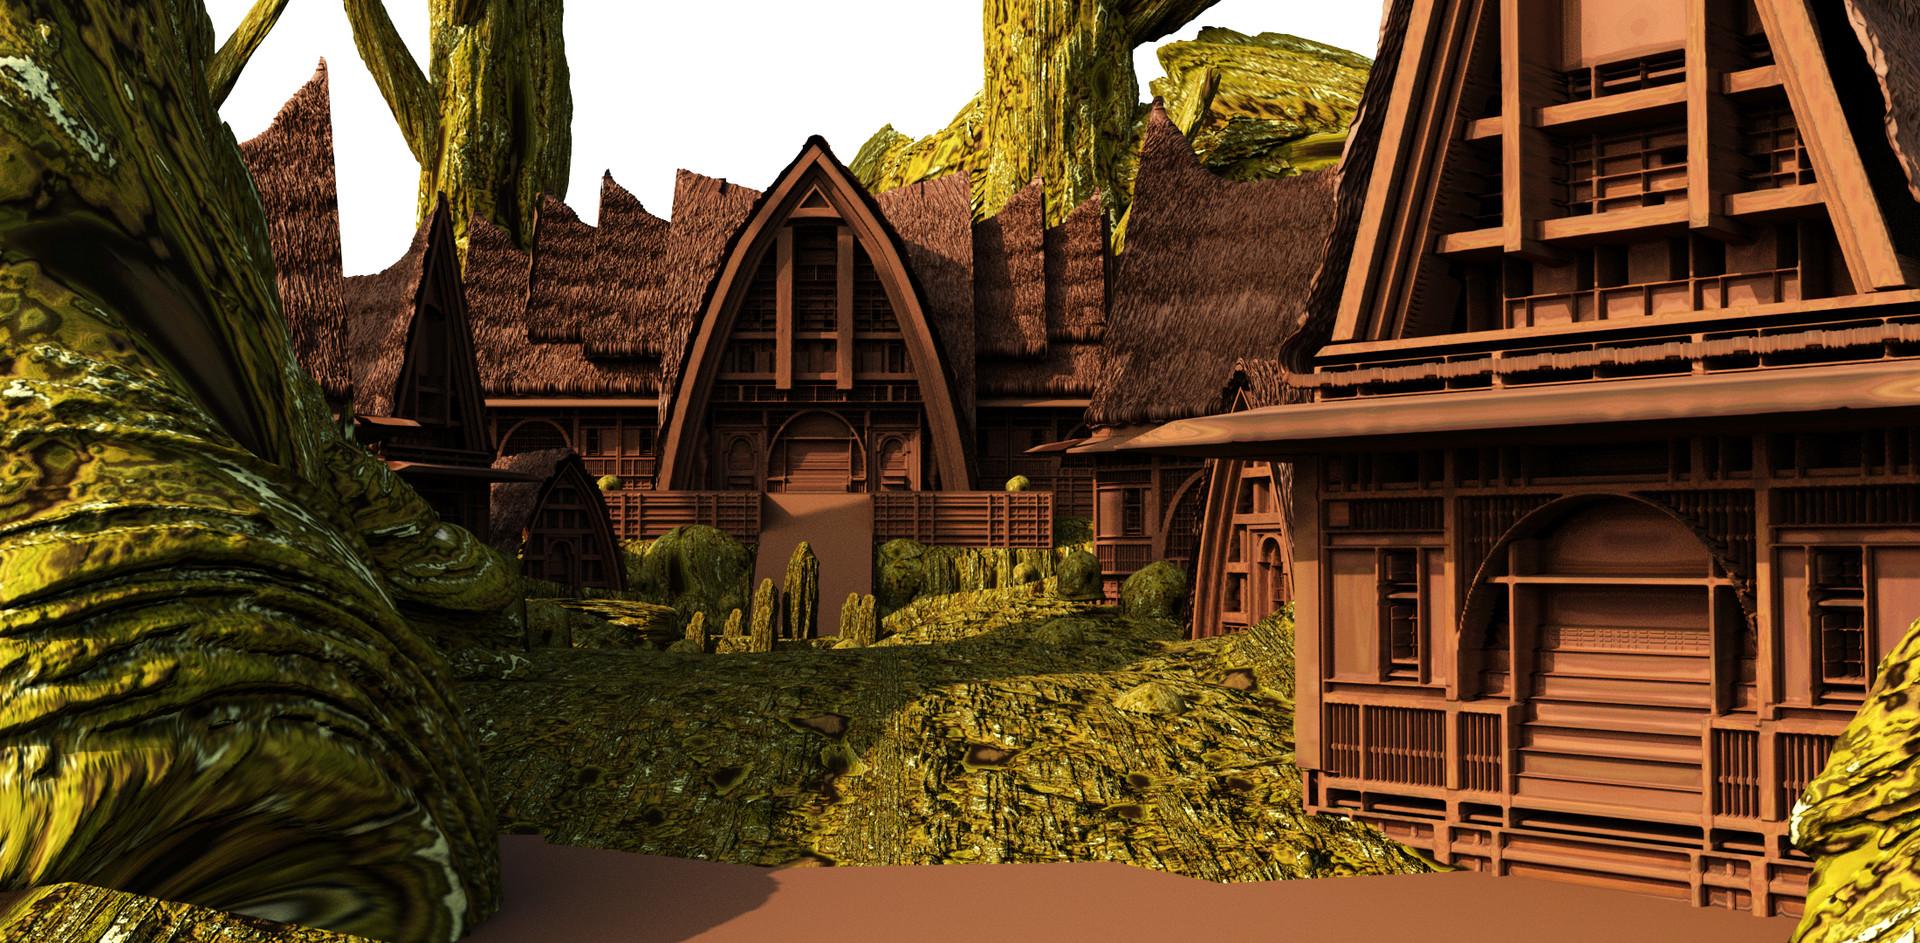 Jack eaves kobo koman town new render